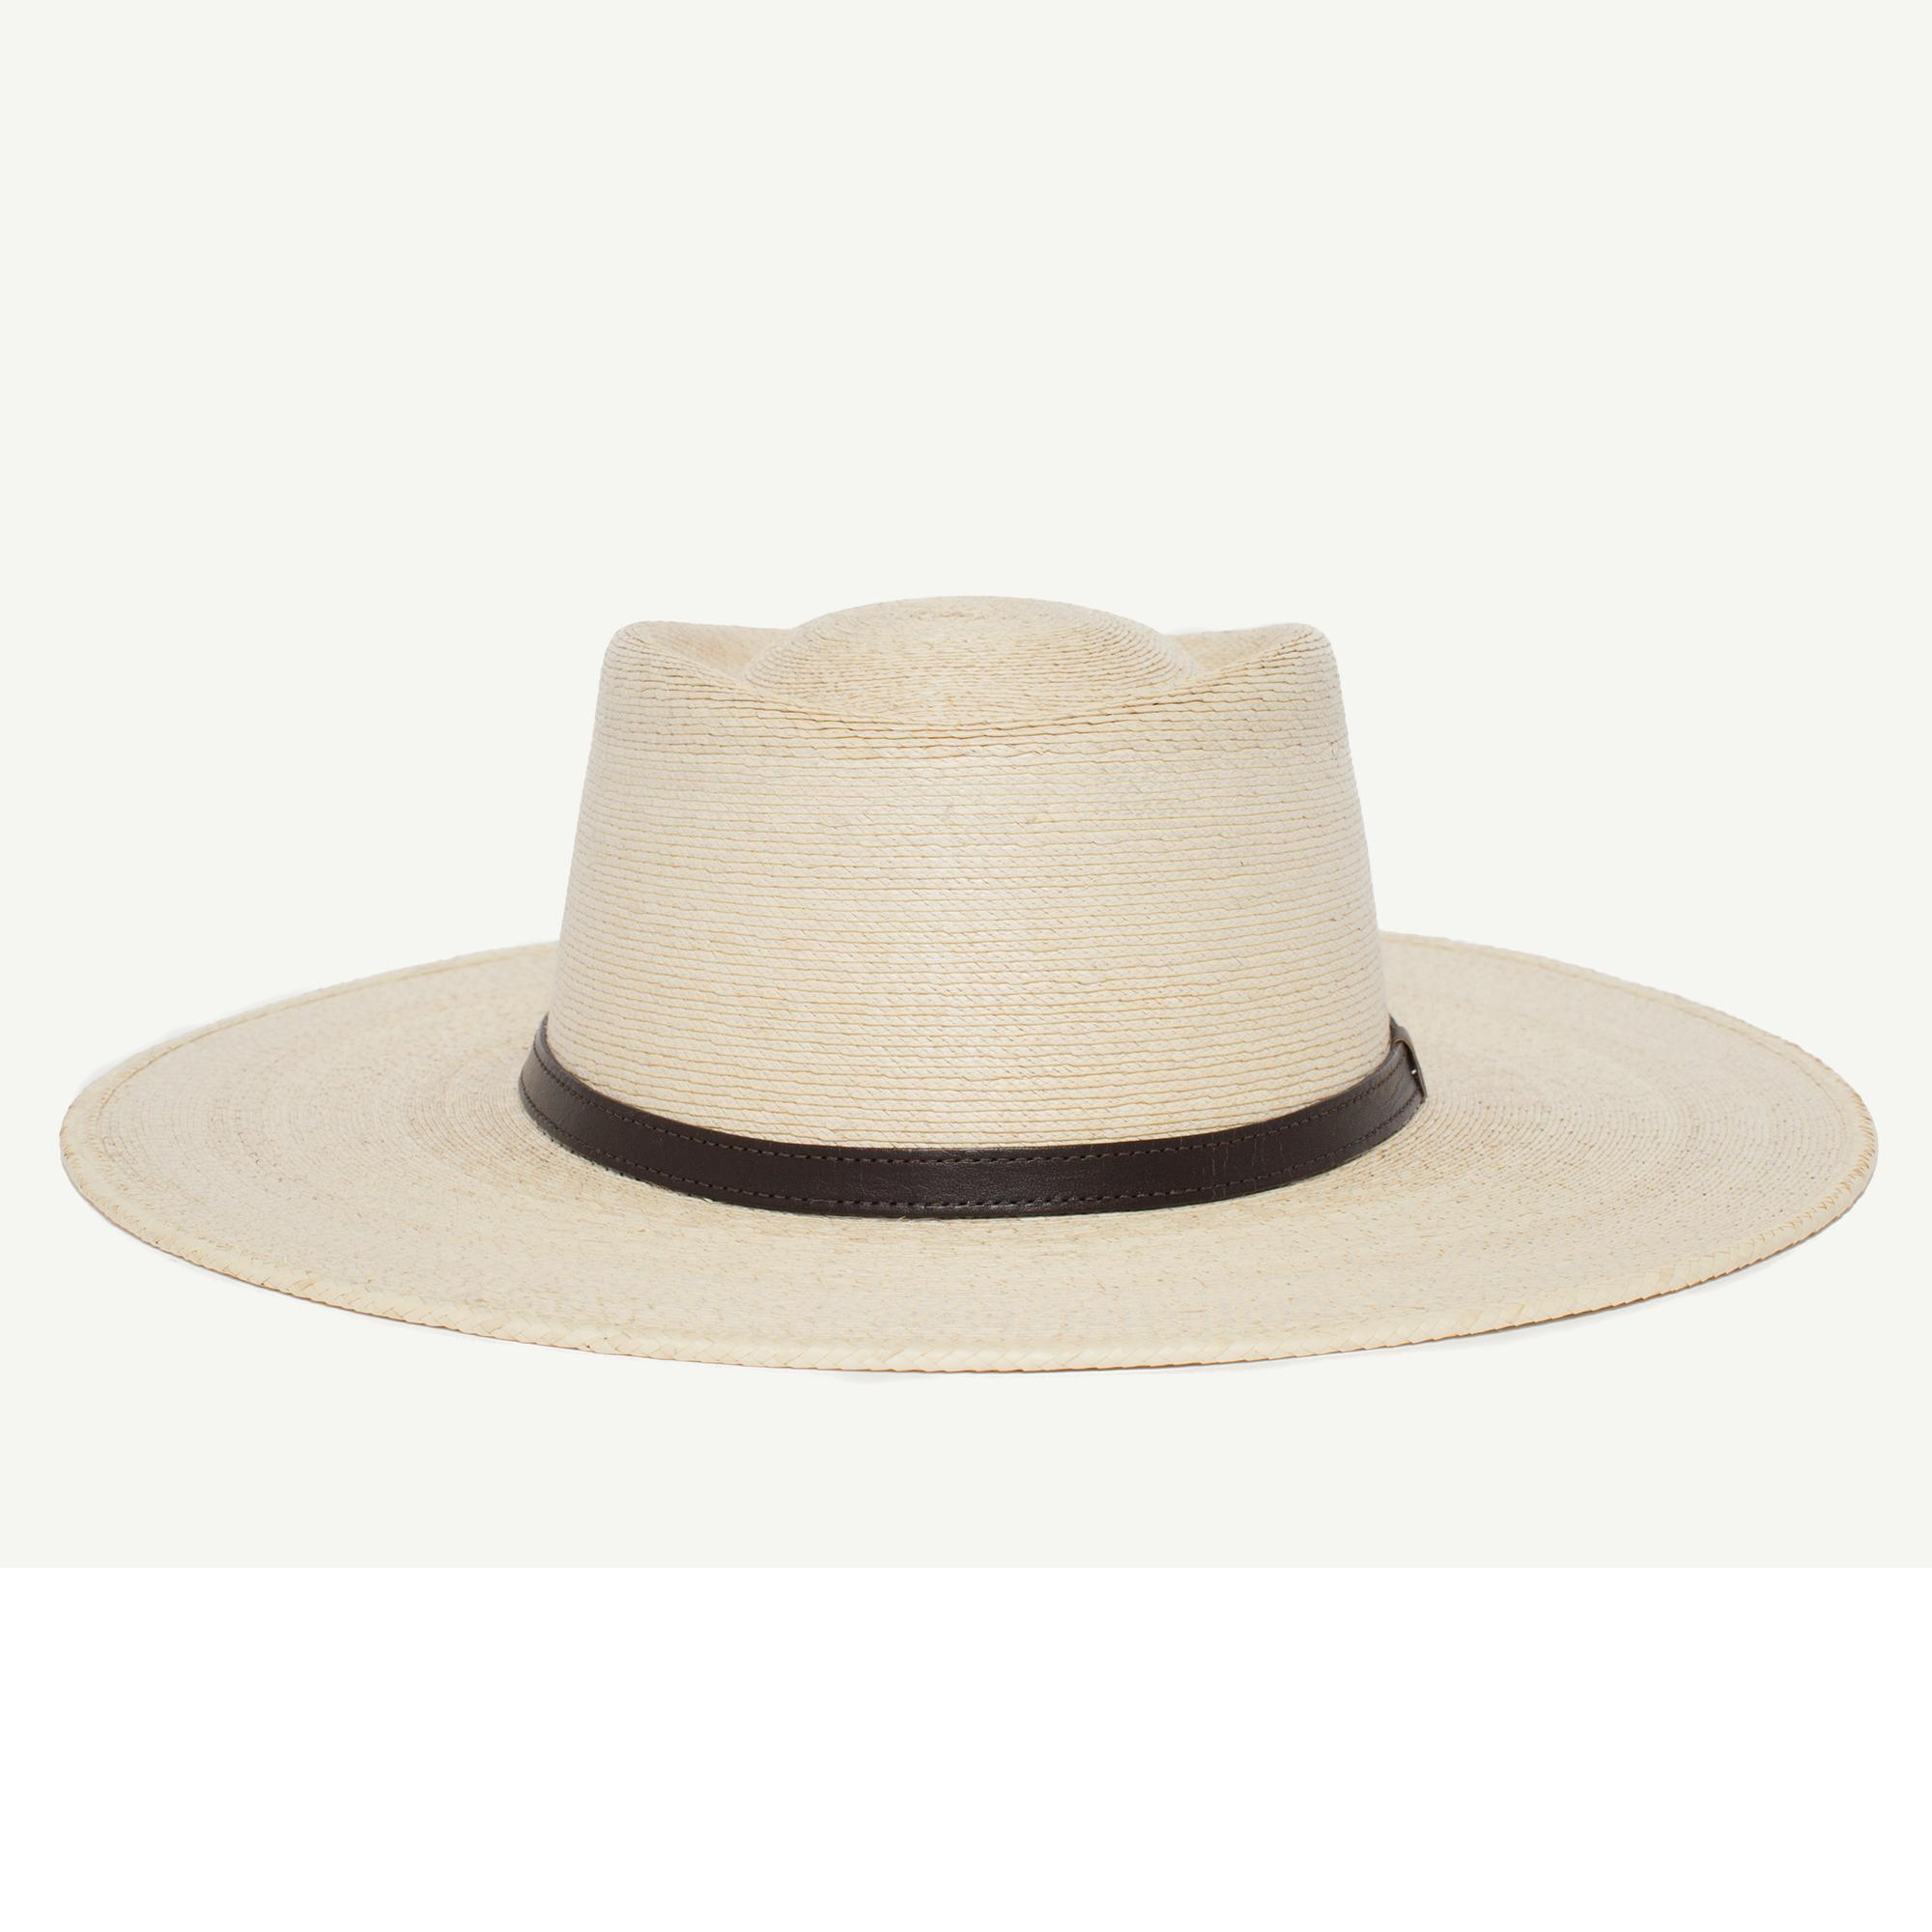 3158e17b6 Baja | Hats Off!! | Wide brim fedora, Hats, Straw fedora